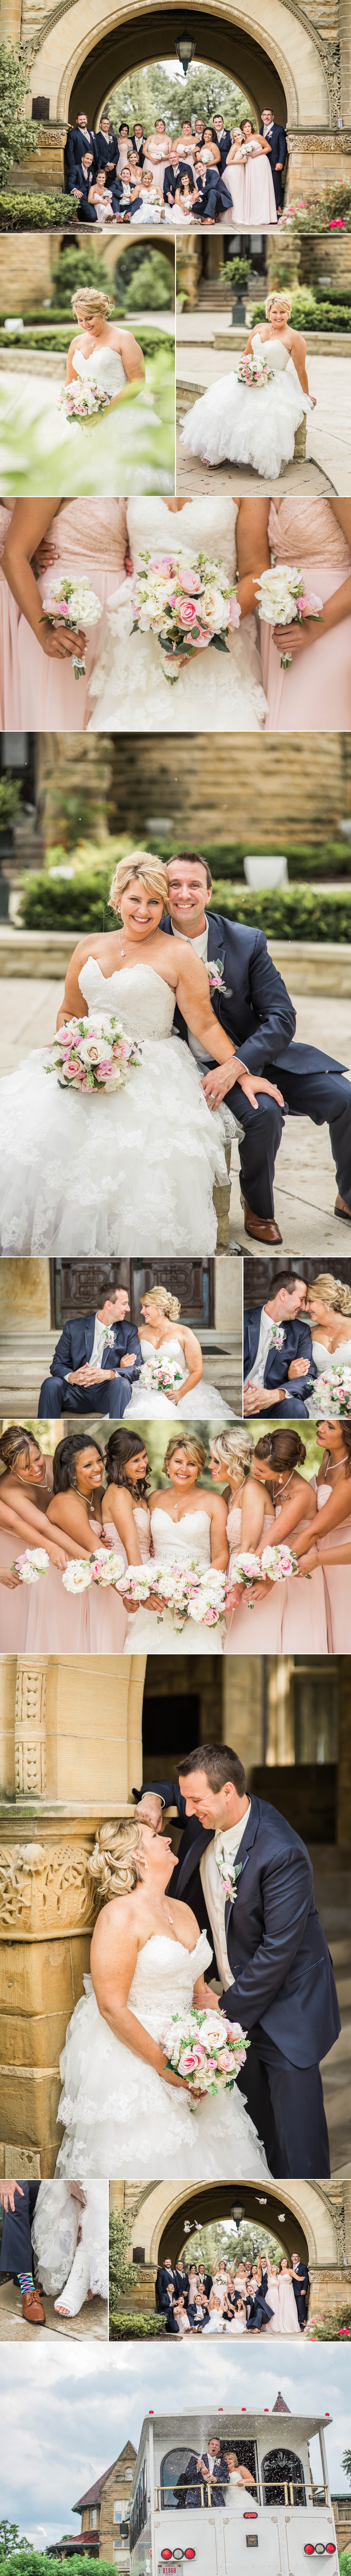 wedding-wedding day-downtown fort wayne-bride-groom-love-wedding party